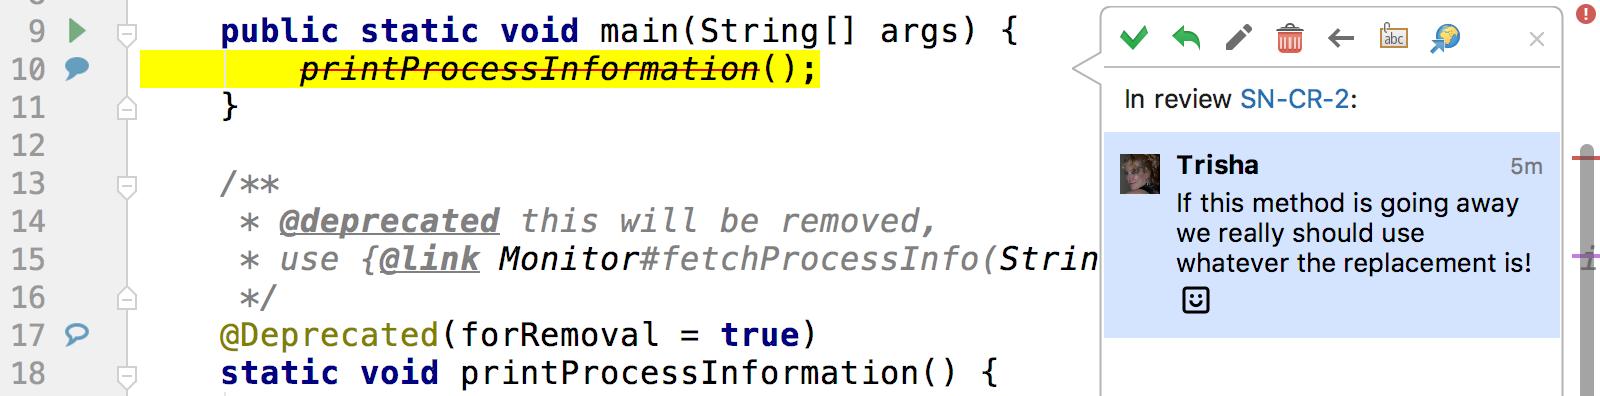 17-using-deprecated-method